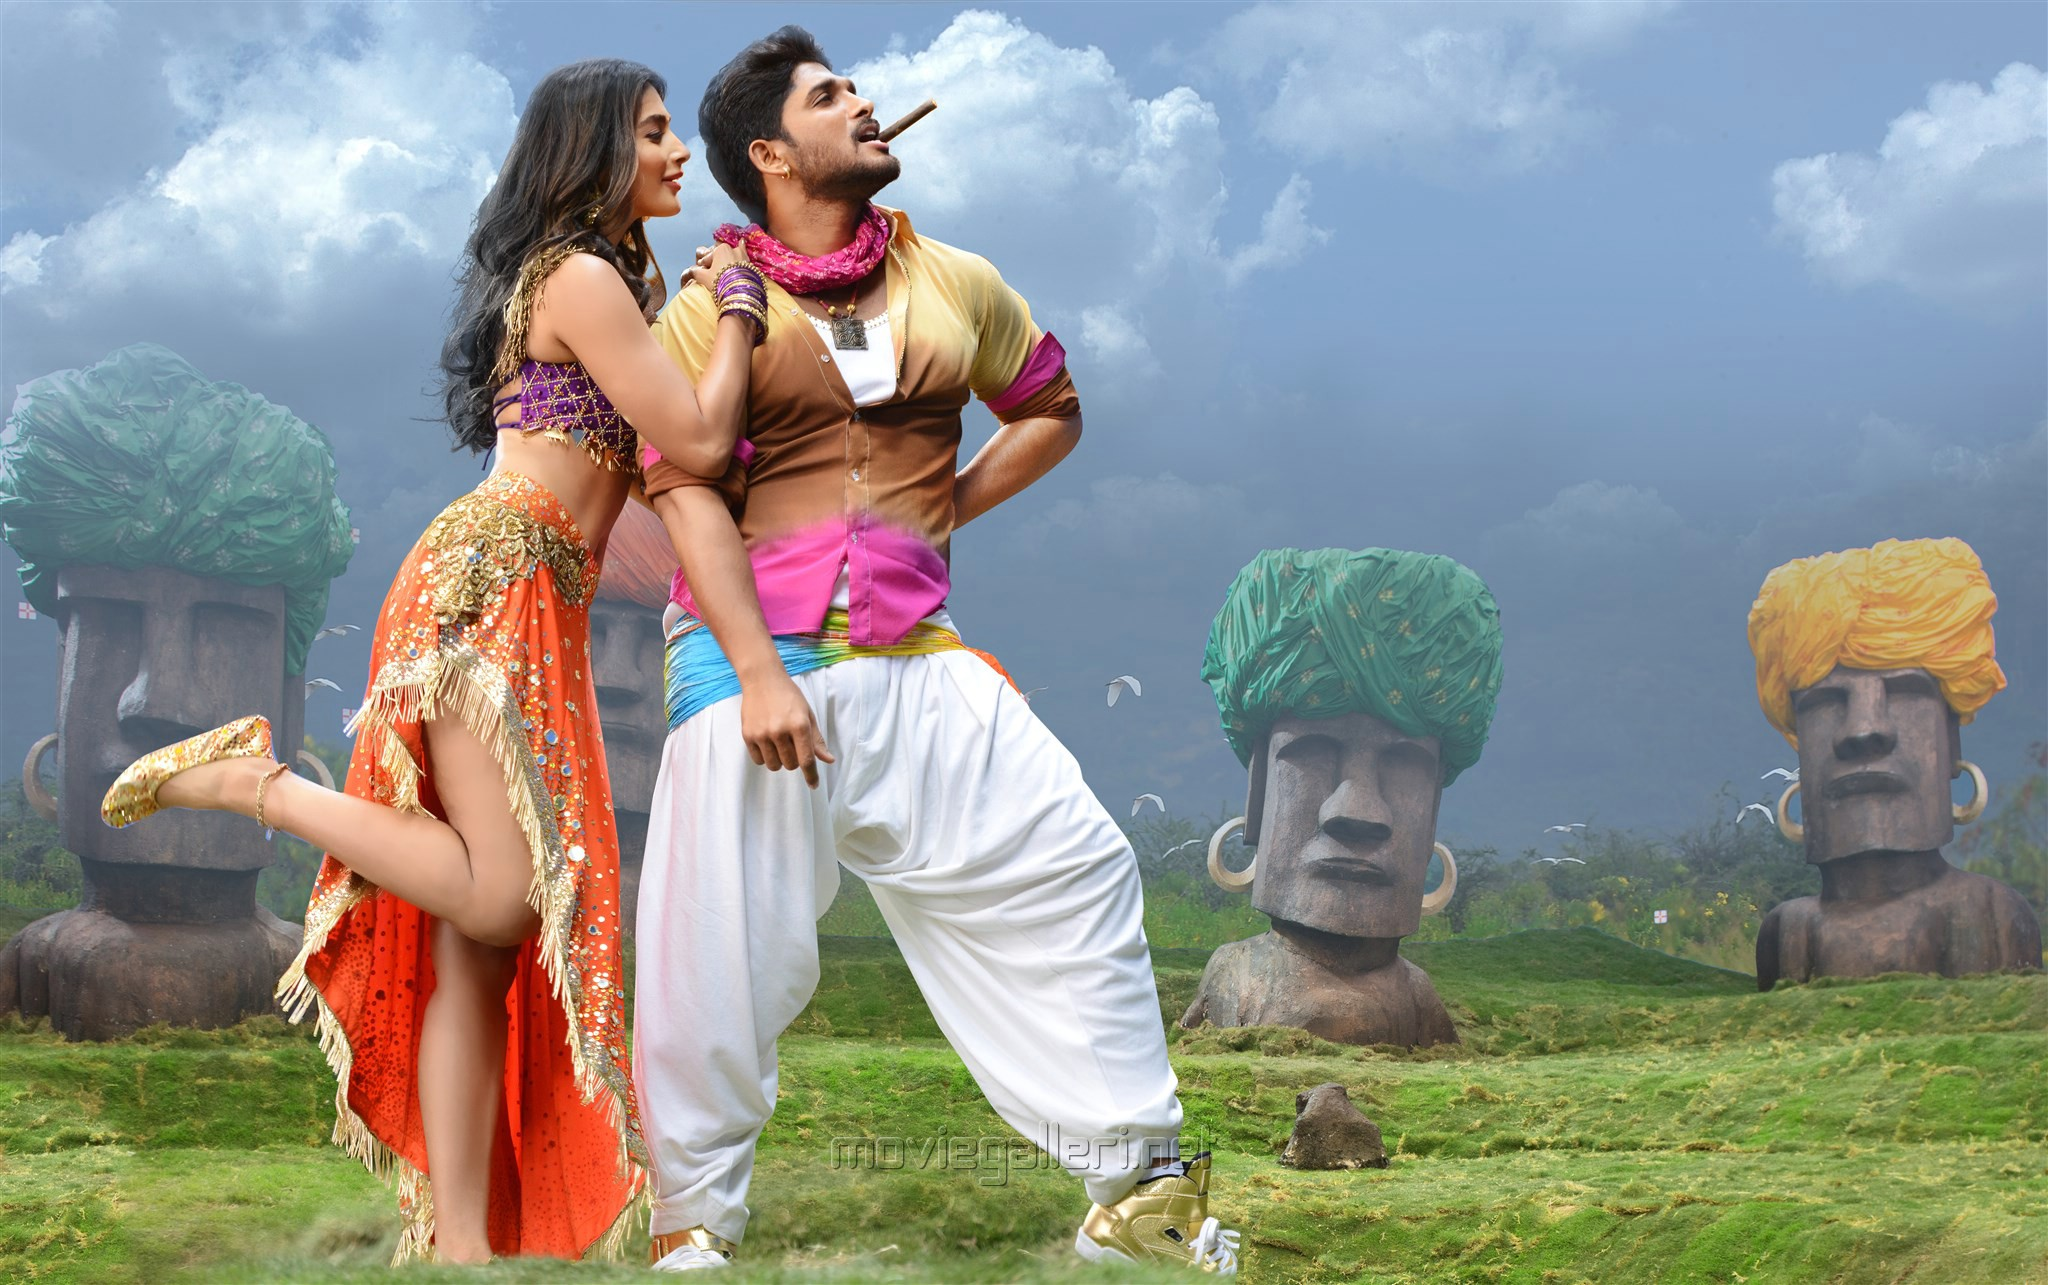 Pooja Hegde, Allu Arjun in Duvvada Jagannadham HD Stills